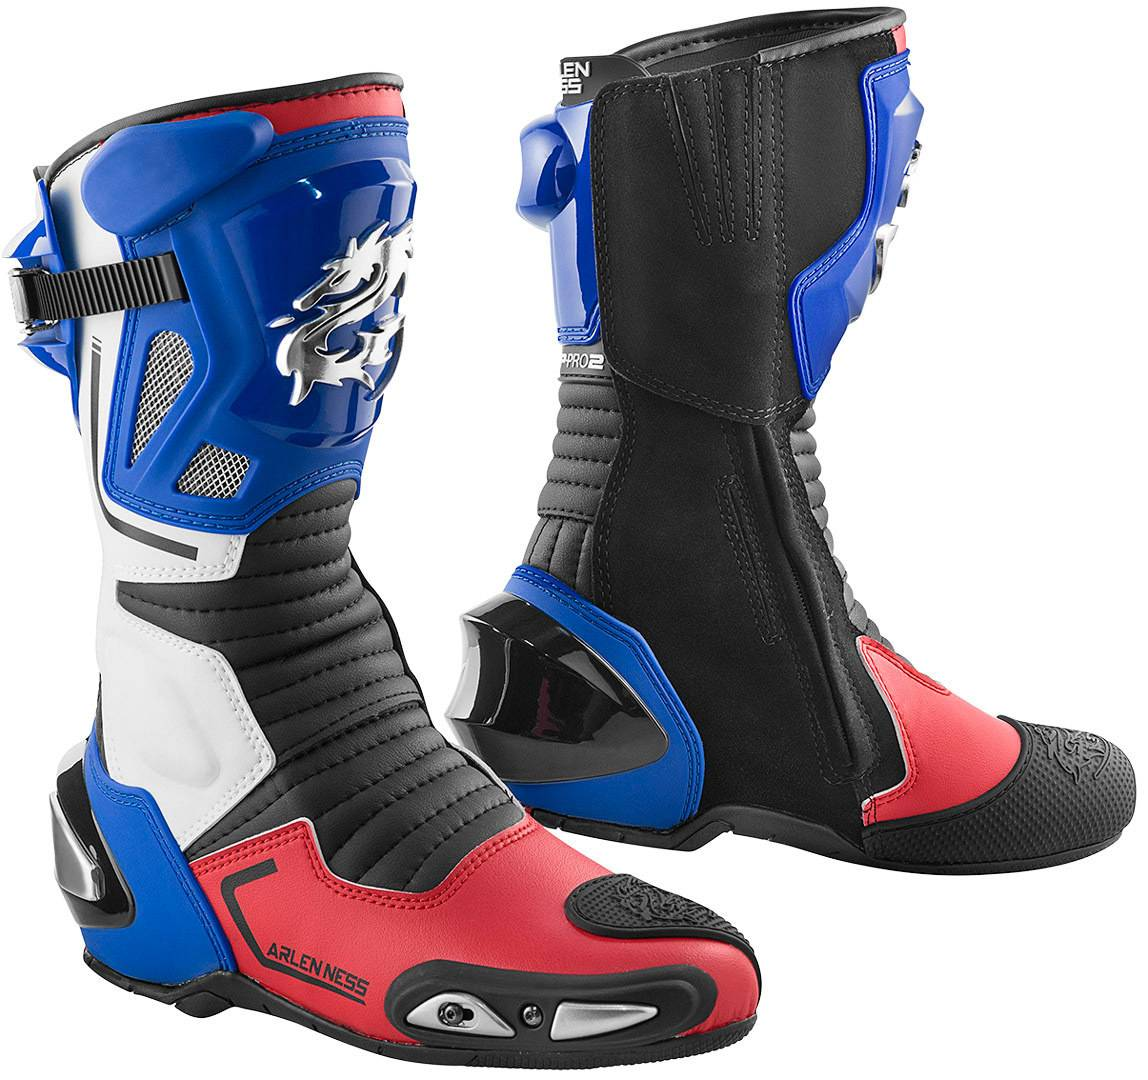 Arlen Ness Sugello Bottes de moto Blanc Rouge Bleu taille : 45